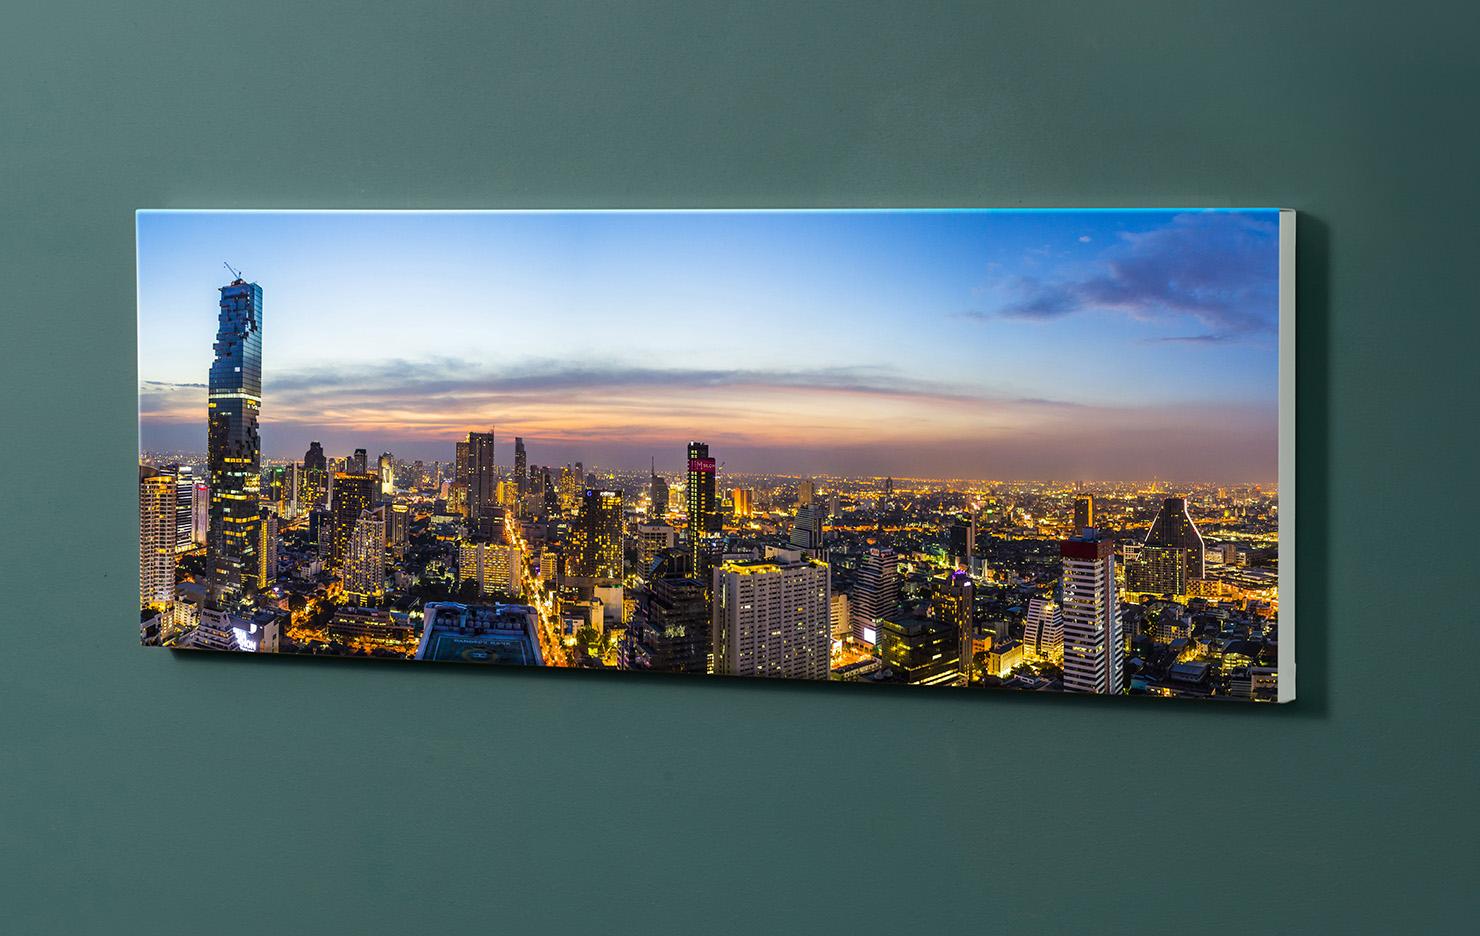 Magnettafel NOTIZ 90x30cm Motiv-Pinnwand M101 Bankok